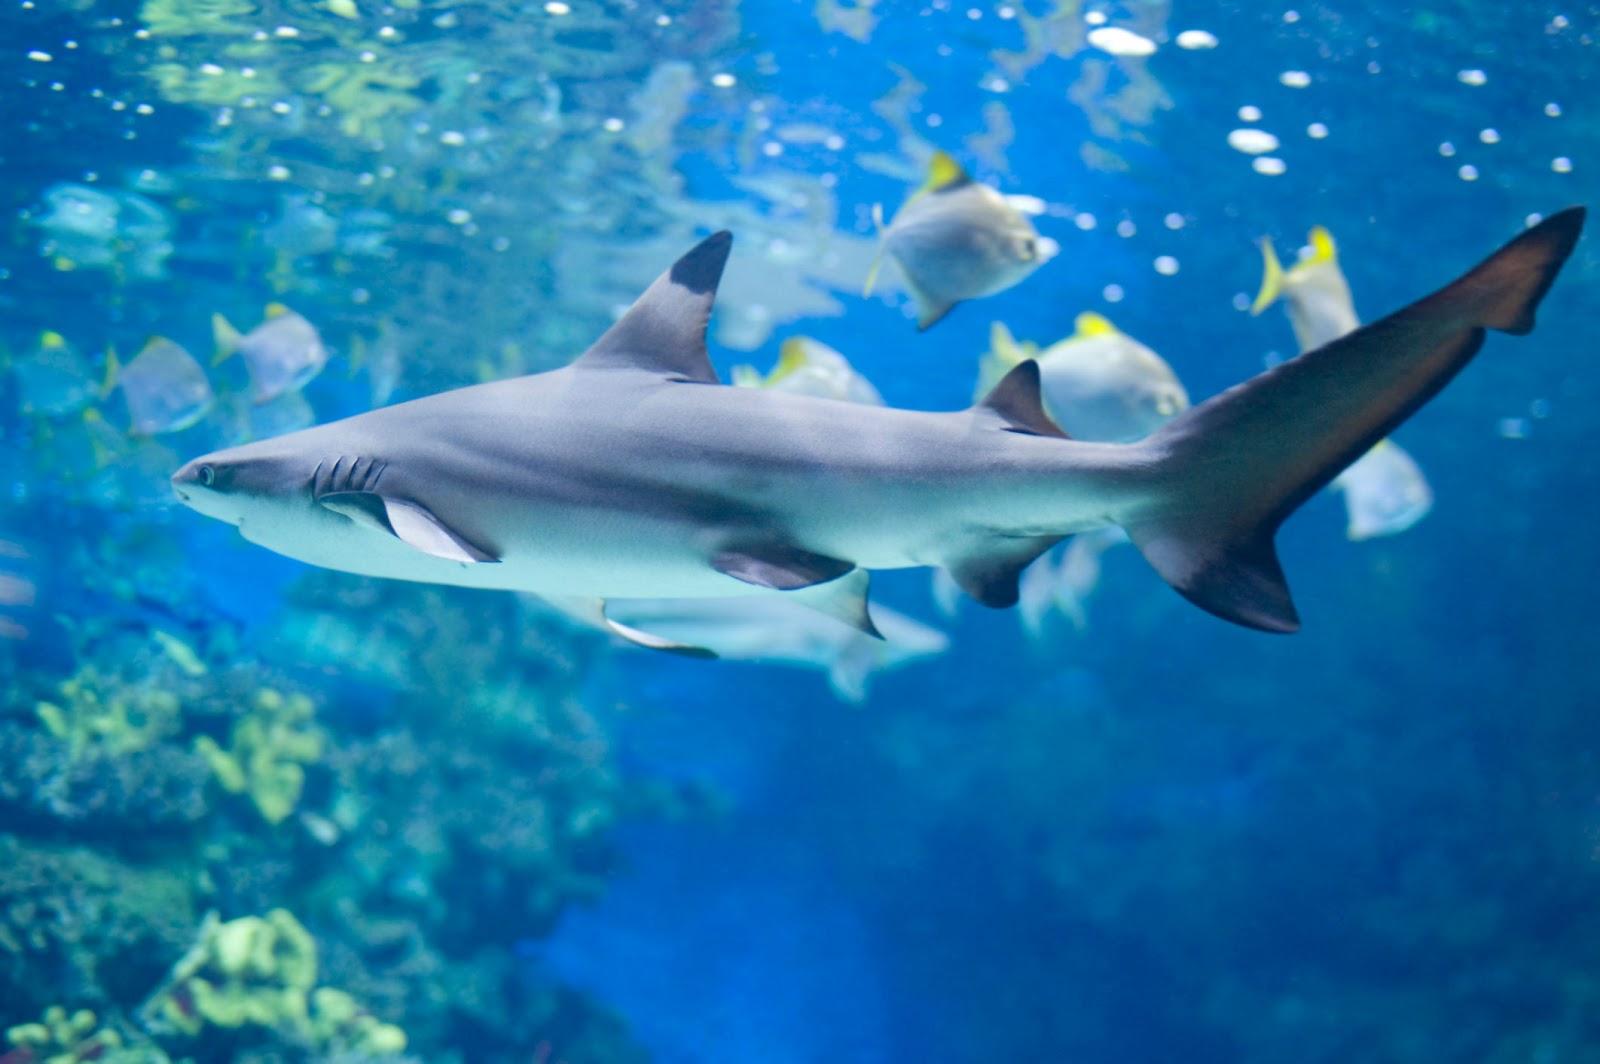 David brett williams shark bait for Small sharks for fish tanks